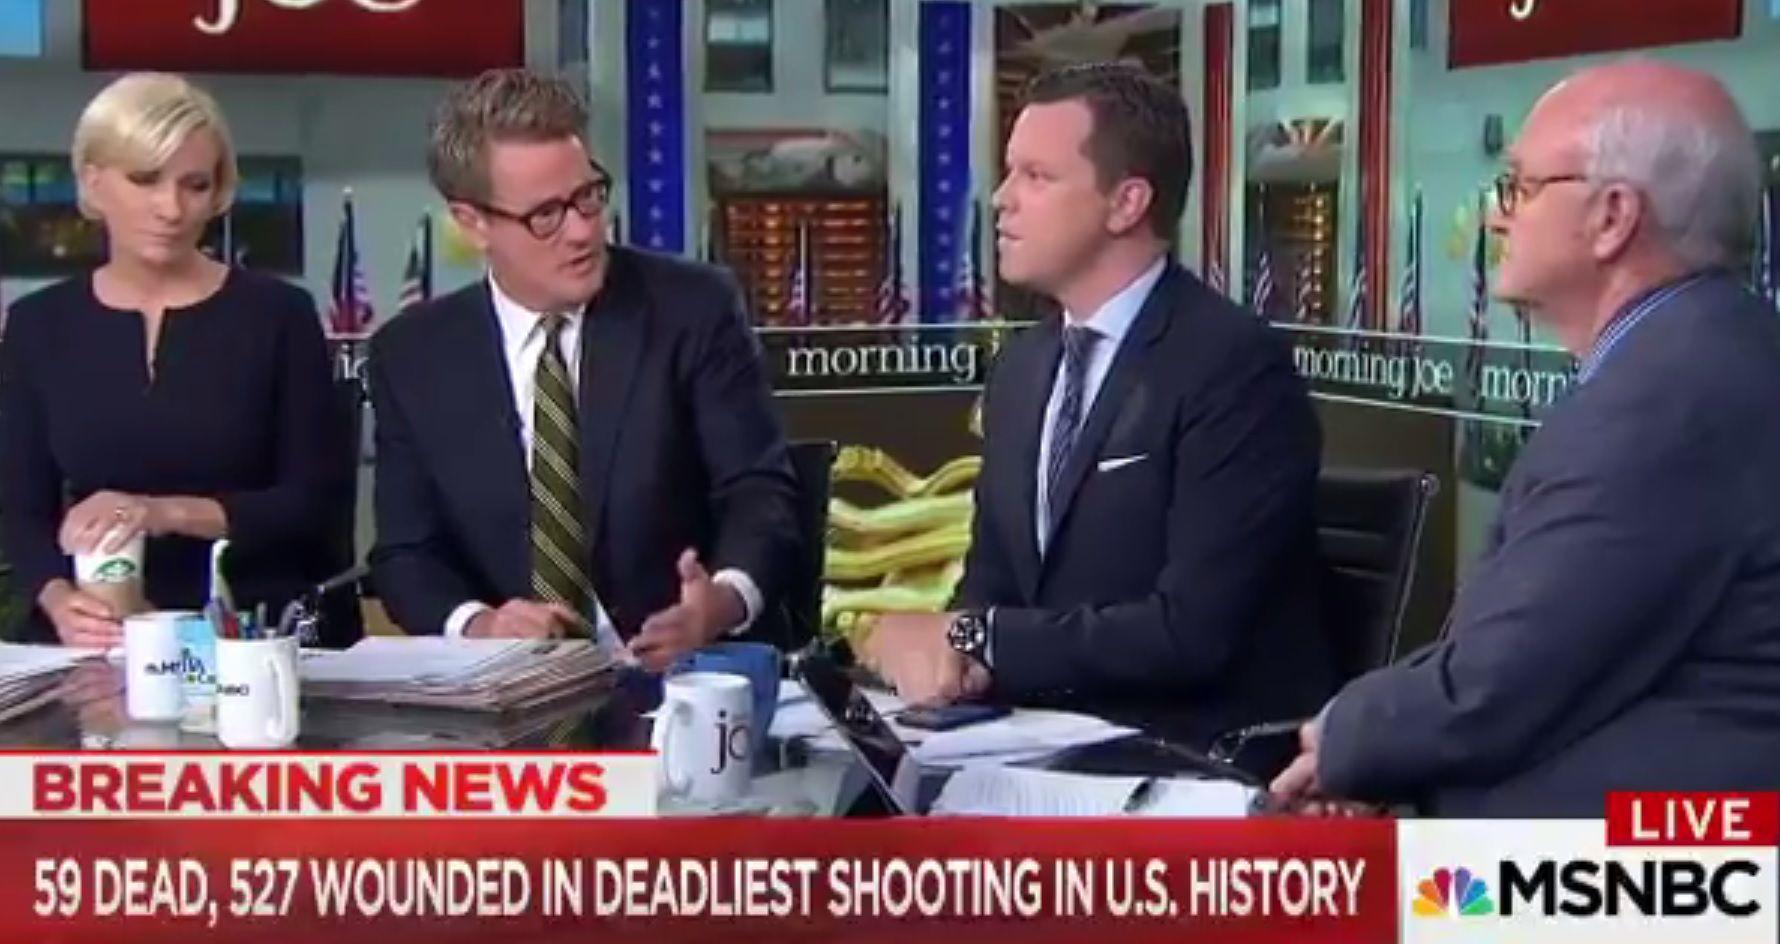 Morning Joe: Trump 'unkind' and 'brutal'